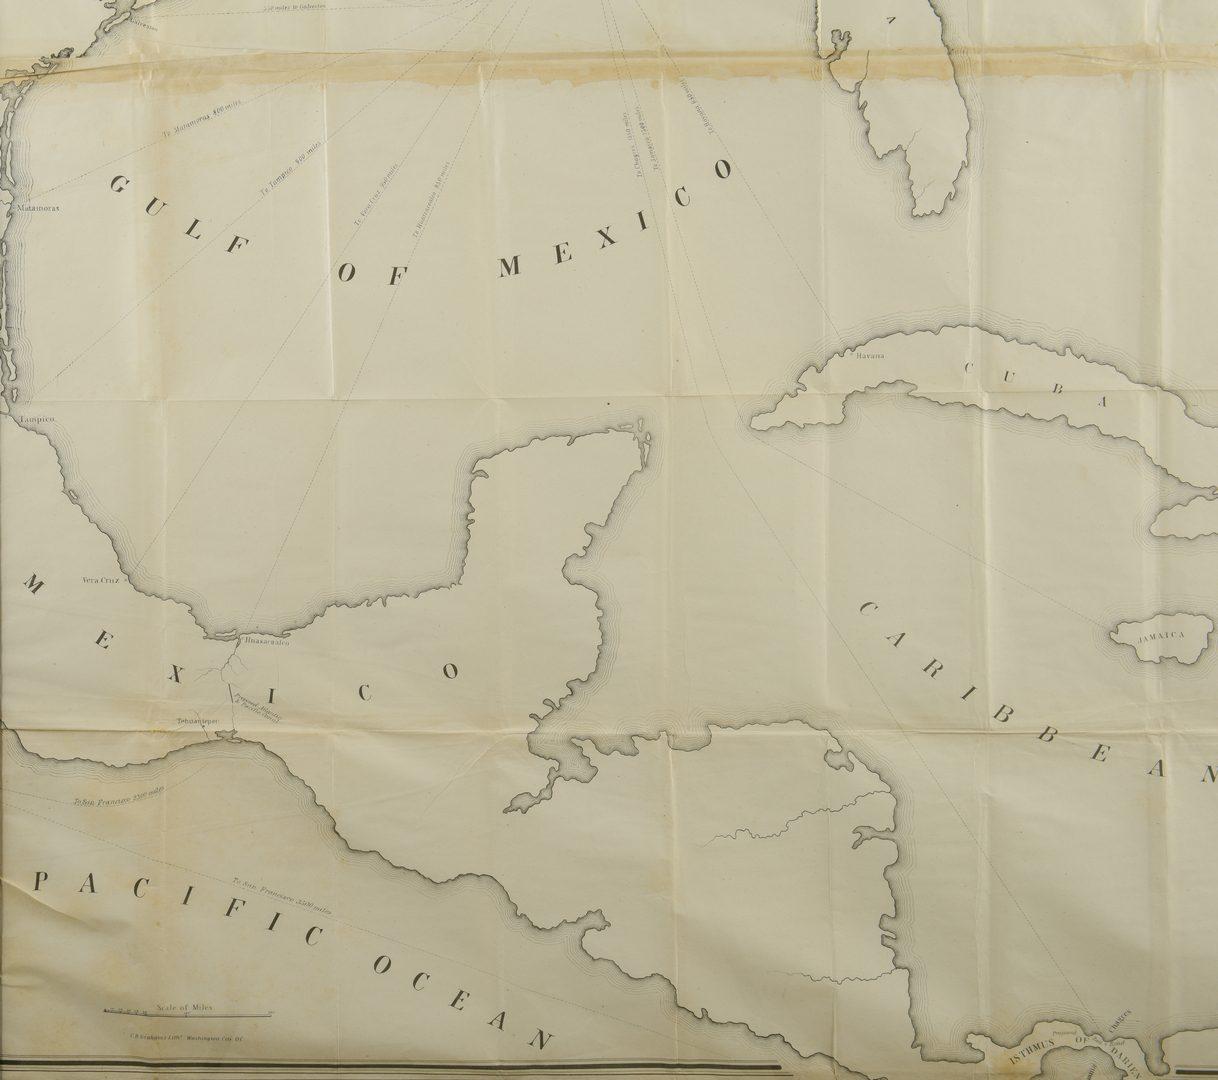 Lot 540: Skeleton Map Showing Railroads, United States GPO, 1849